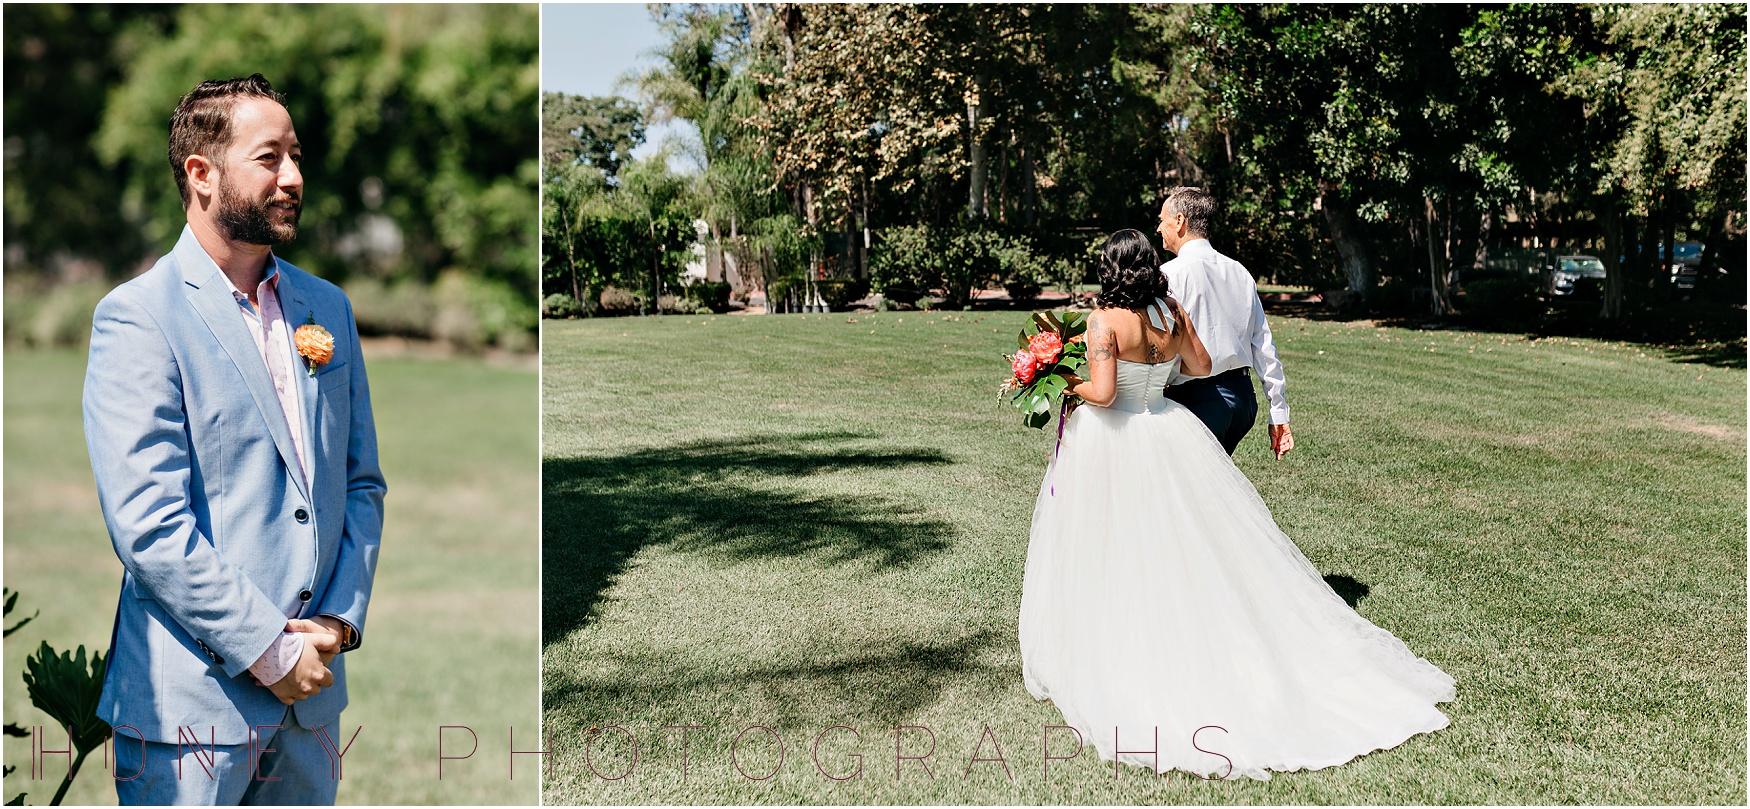 colorful_ecclectic_vibrant_vista_rainbow_quirky_wedding015.jpg